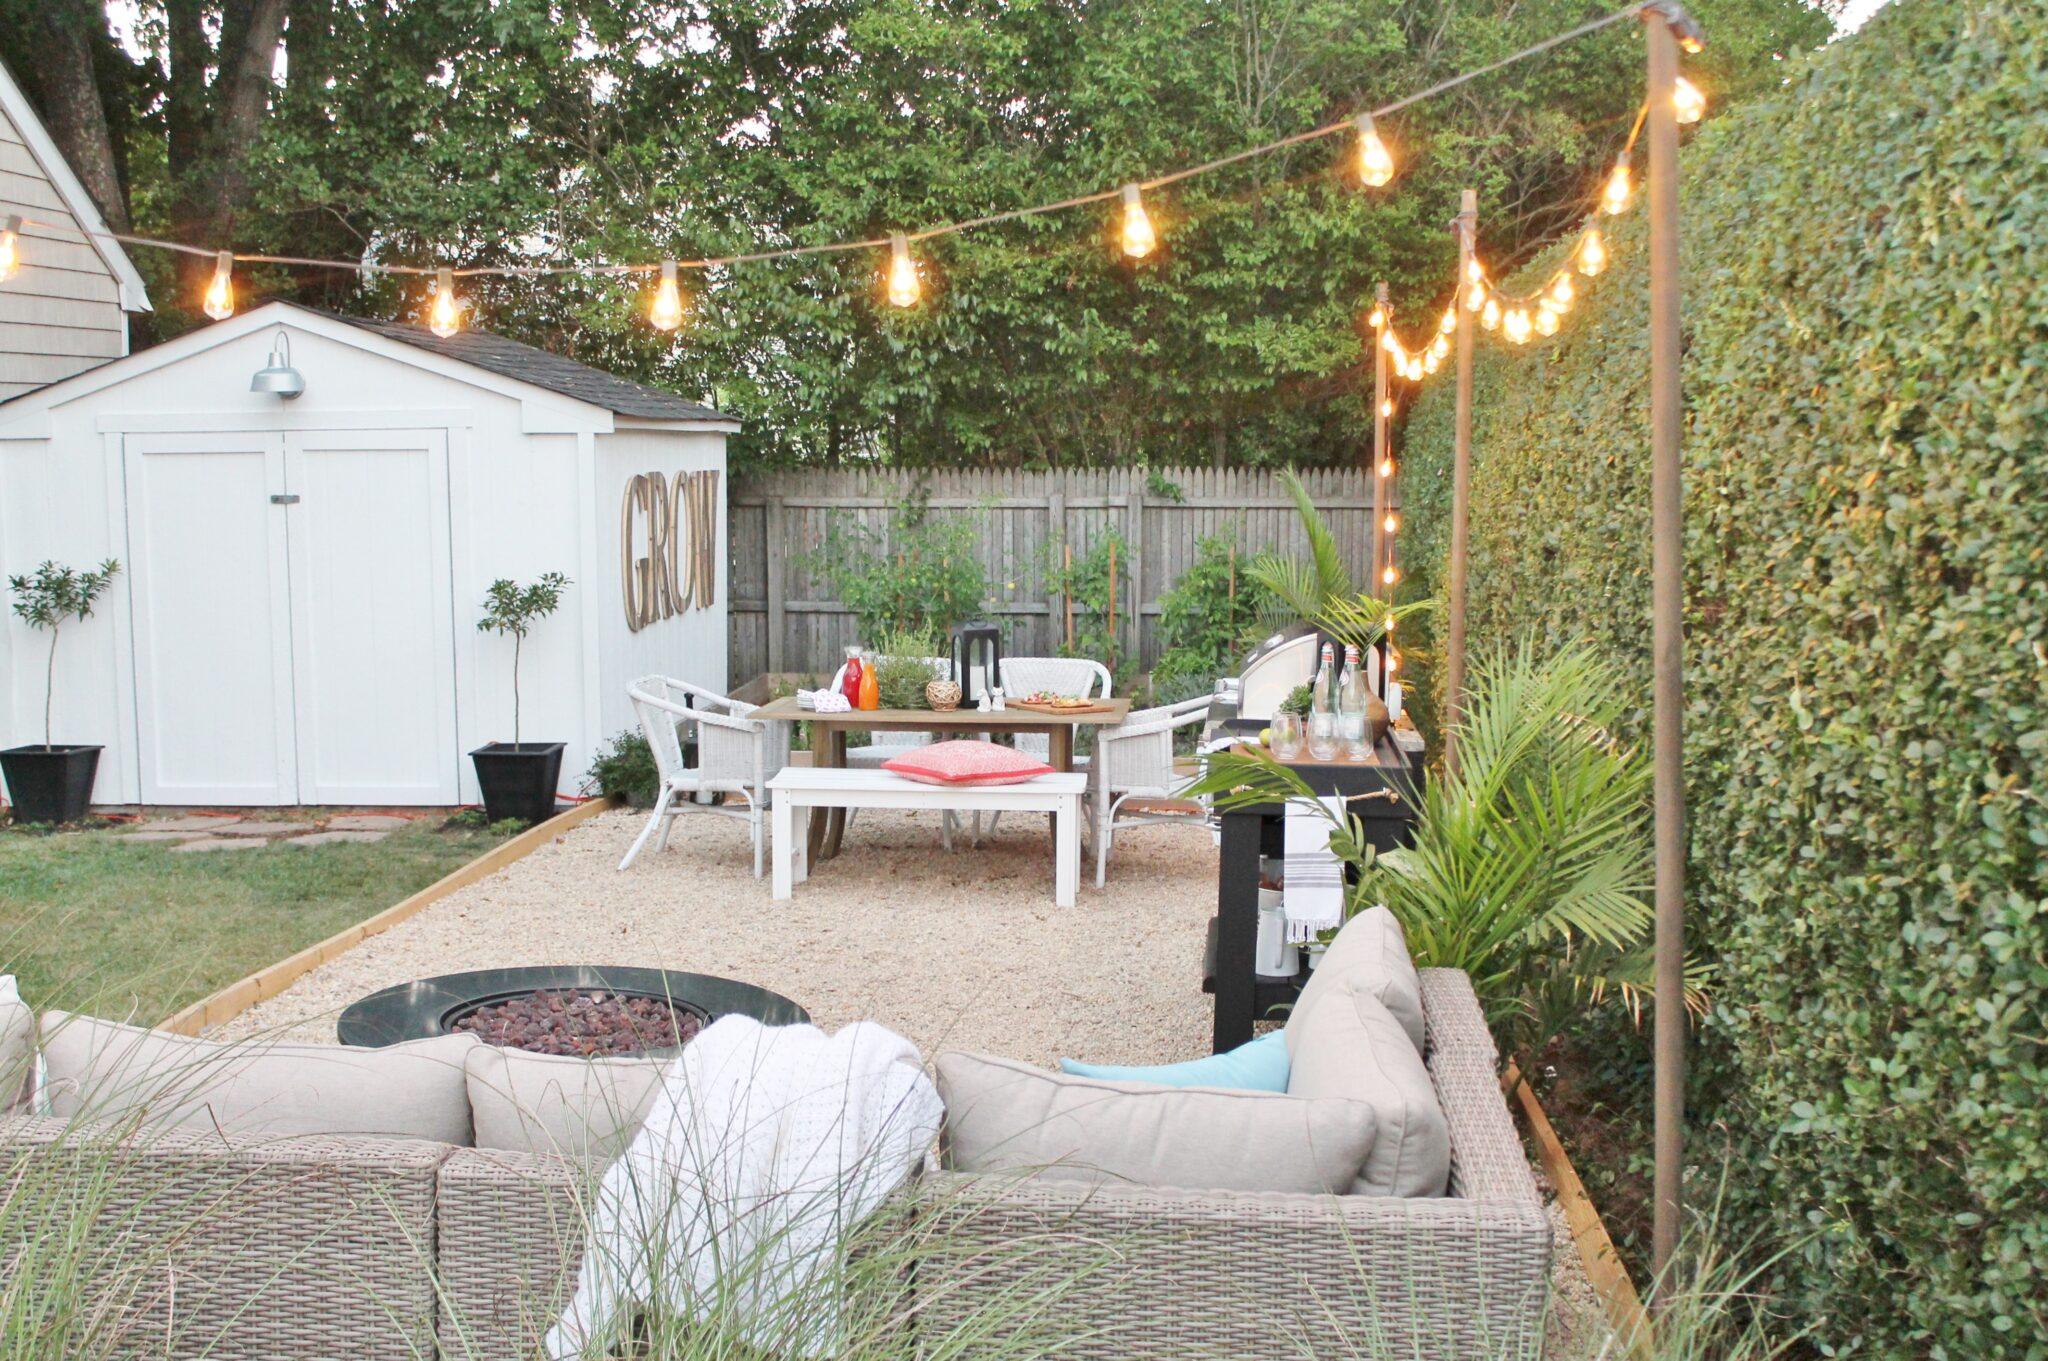 Outdoor String Lights + Small Backyard Reveal - City Farmhouse on Farmhouse Yard Ideas id=12973